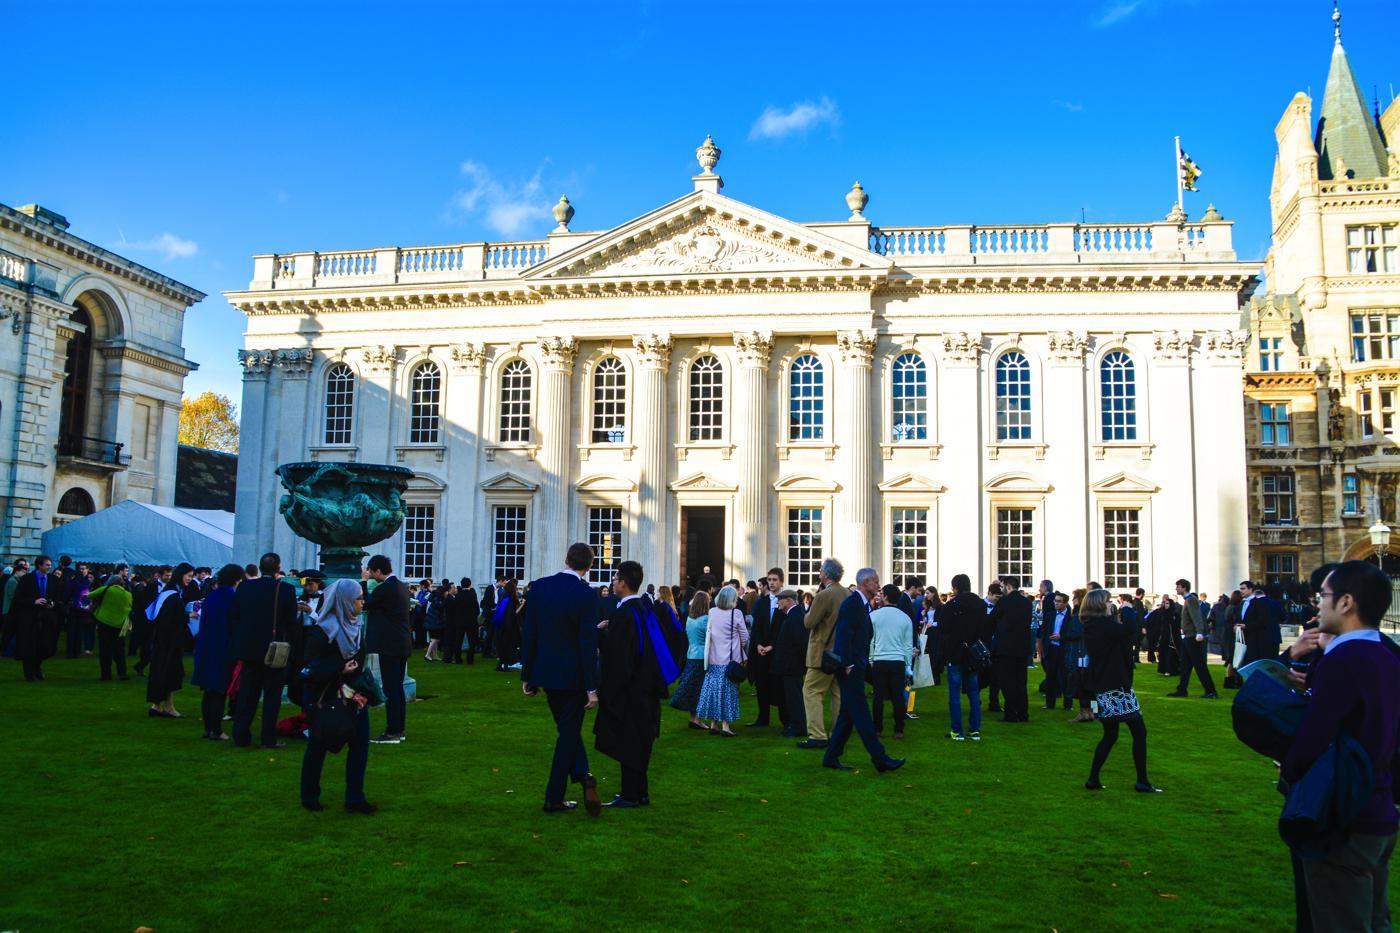 The University of Cambridge, Graduation, Senate House, Cambridge, England (22)